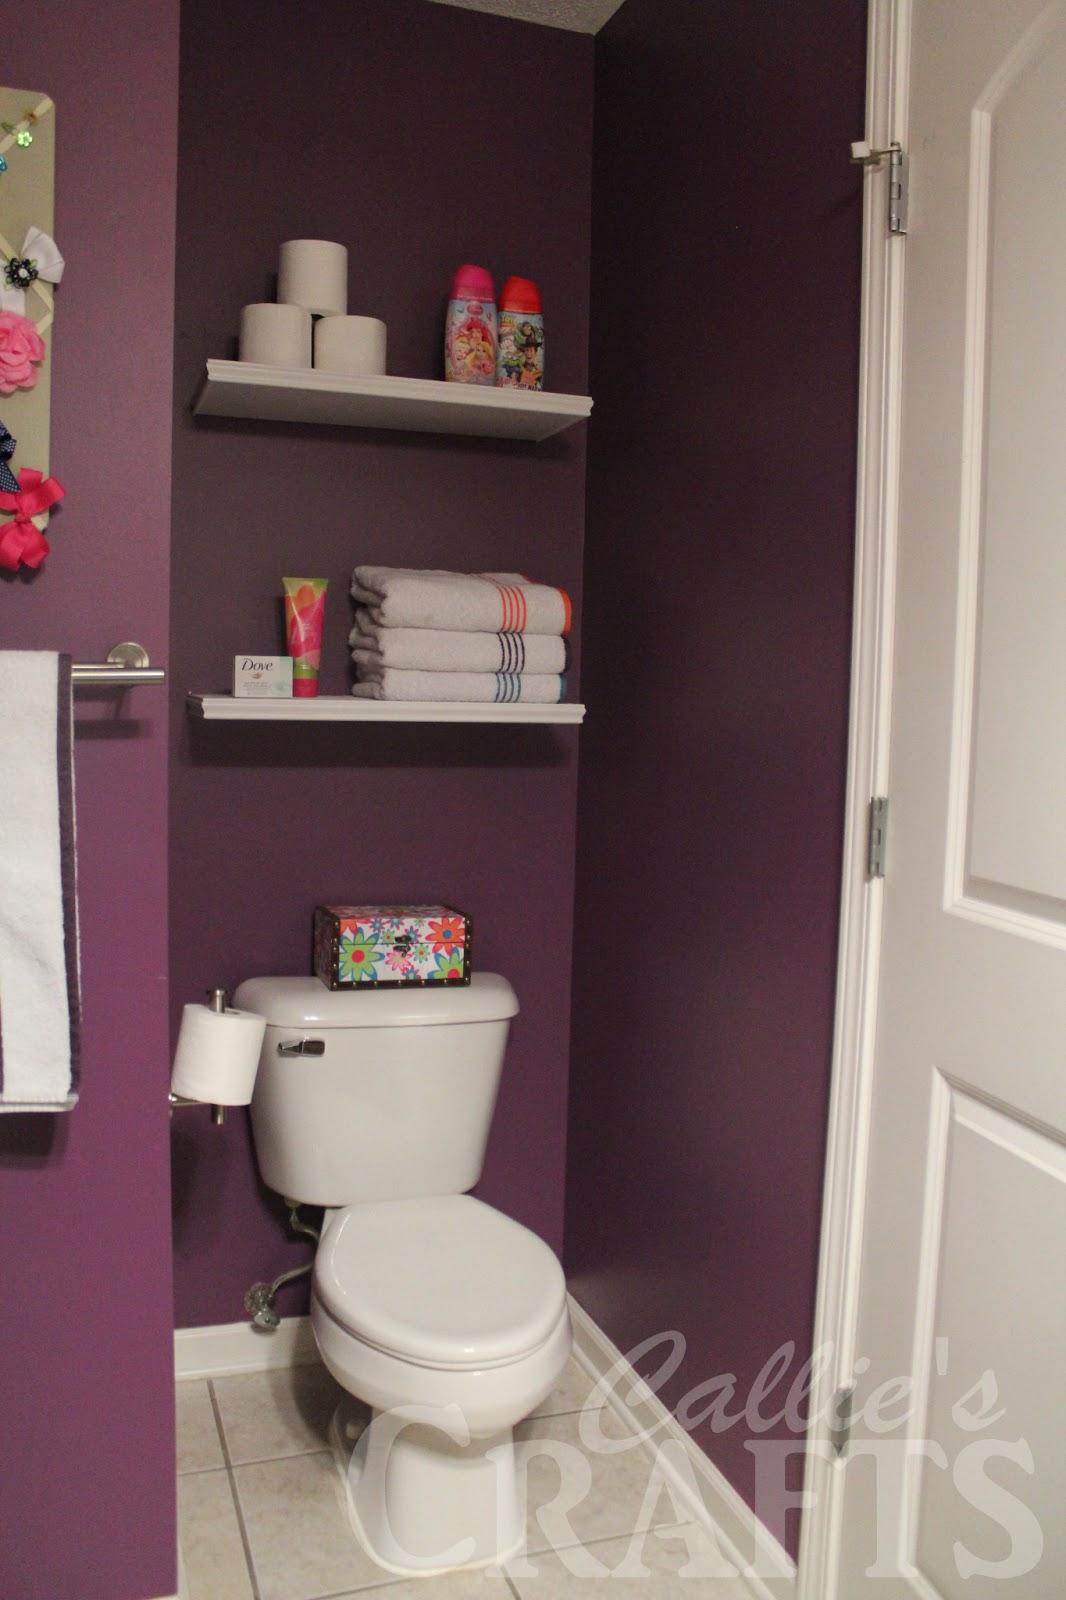 floating shelves above toilet  21 image  wall shelves small bathroom shelf with towel bar small bathroom shelf ikea